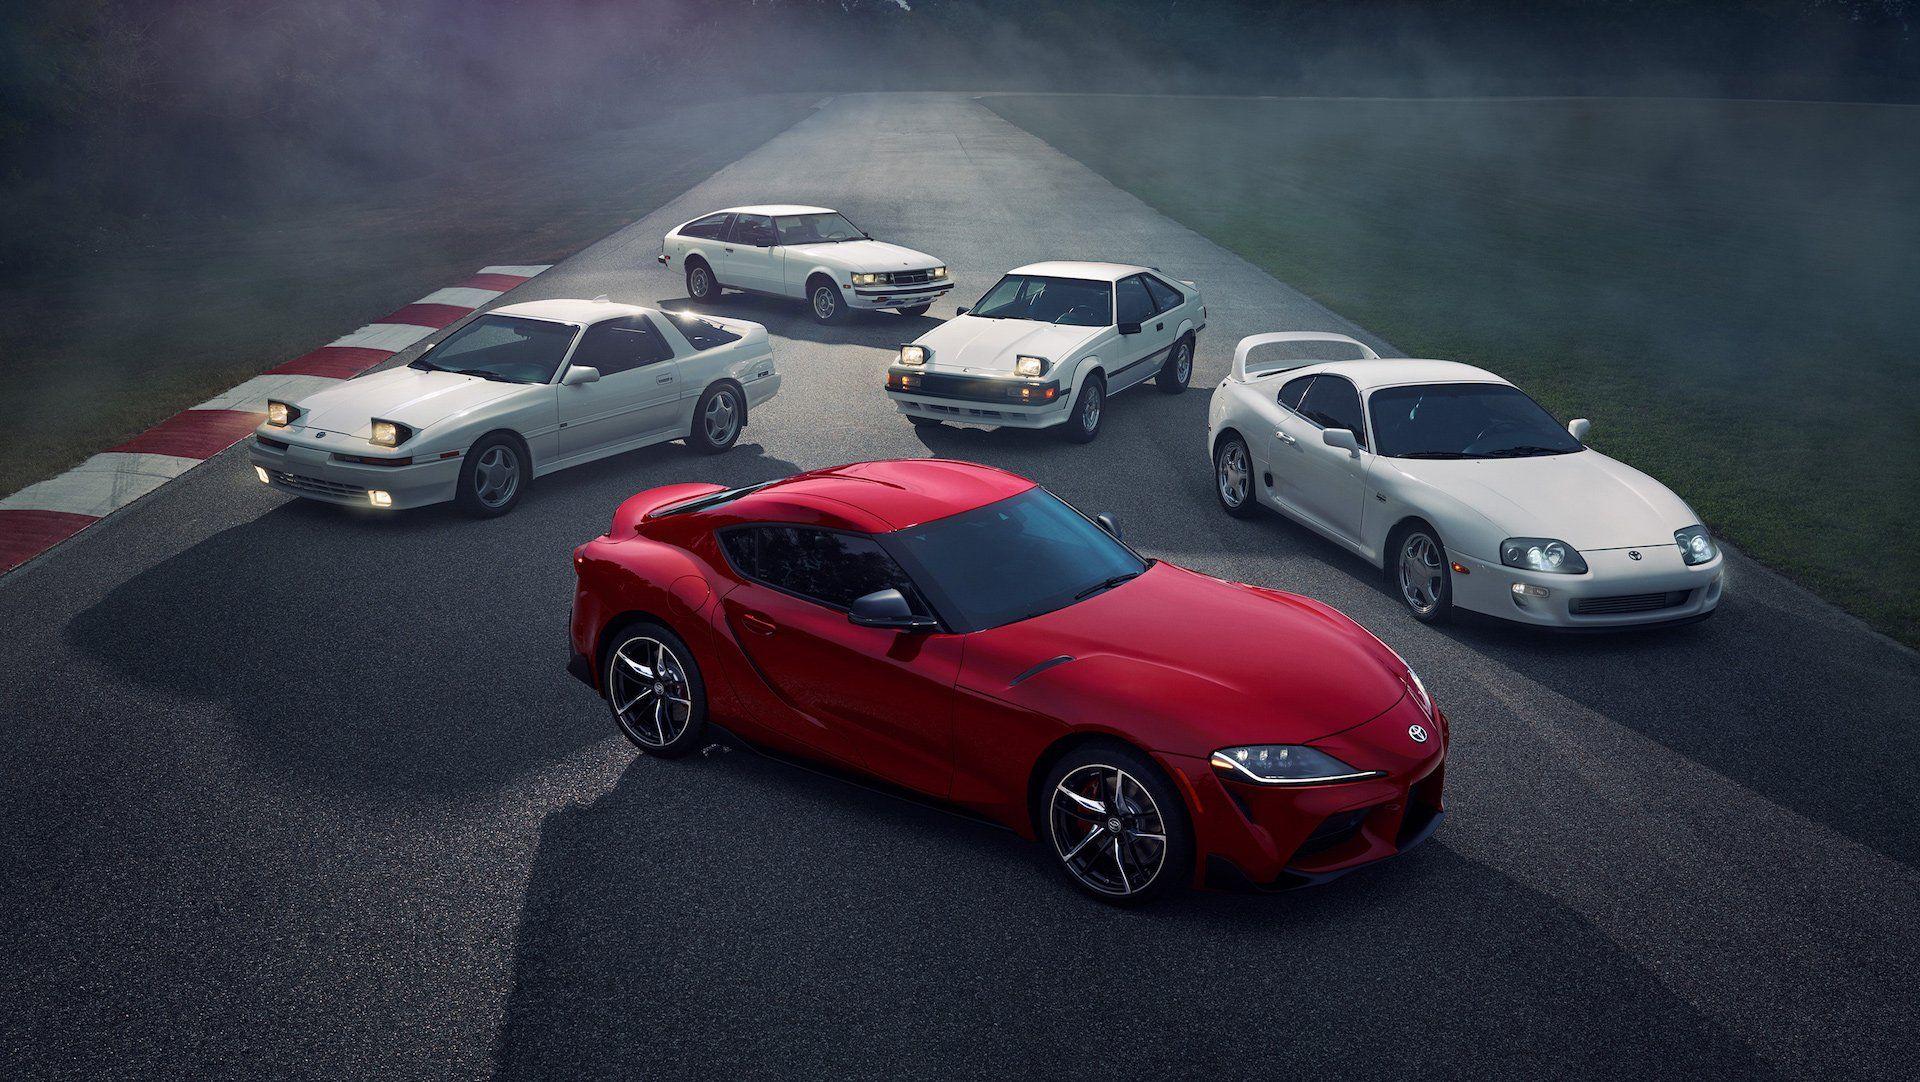 Toyota Supra Evolution | Toyota supra, Toyota, Supra